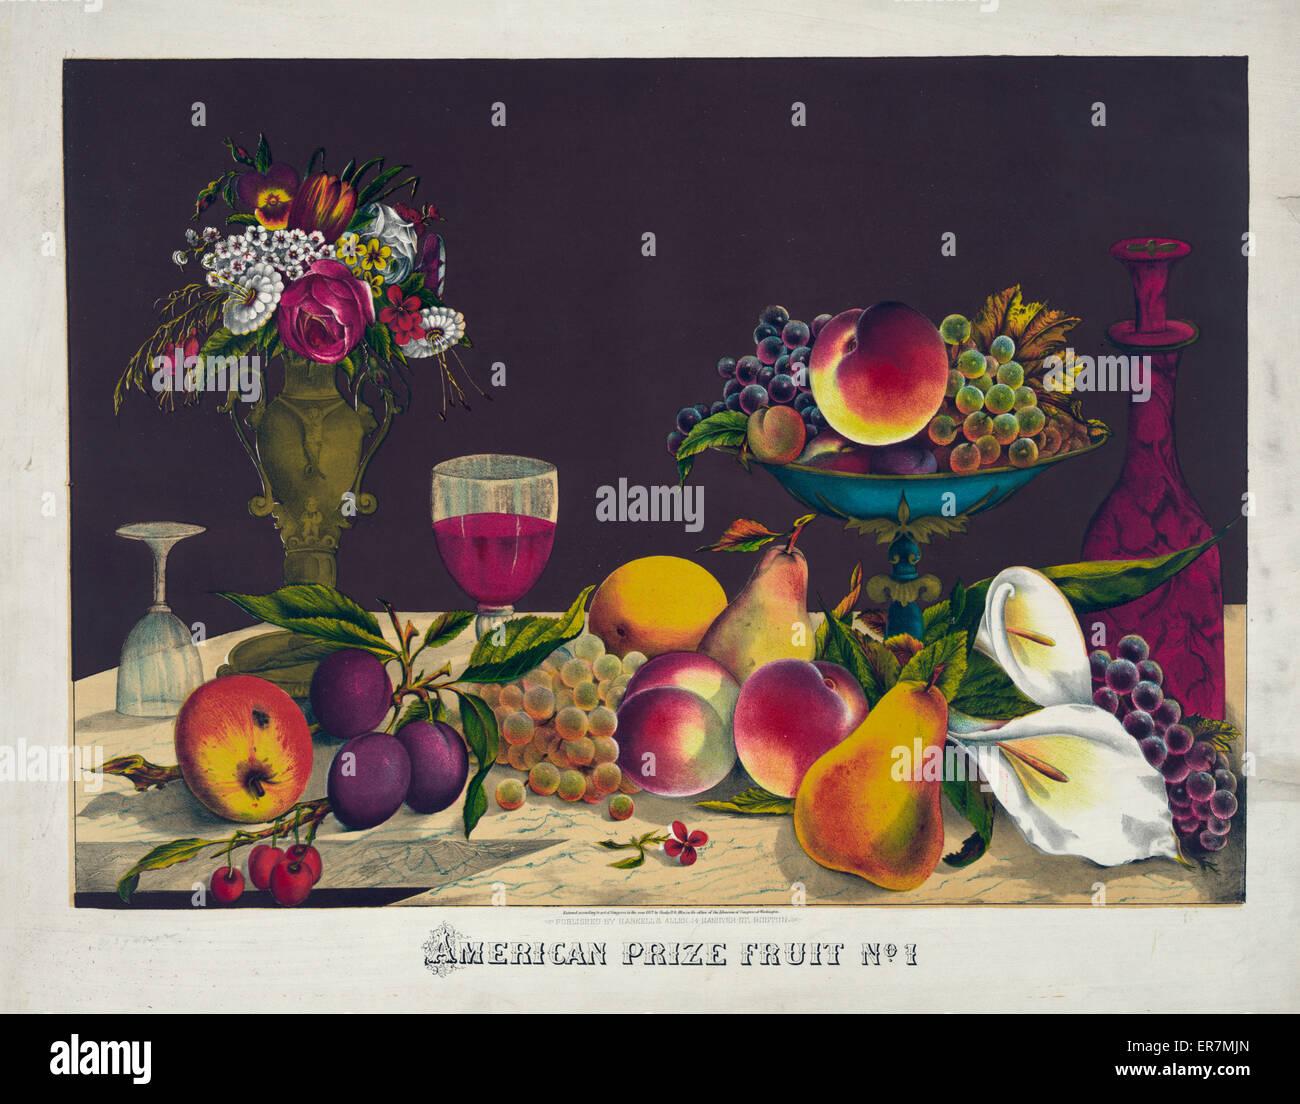 American prise fruit no. 1. - Stock Image